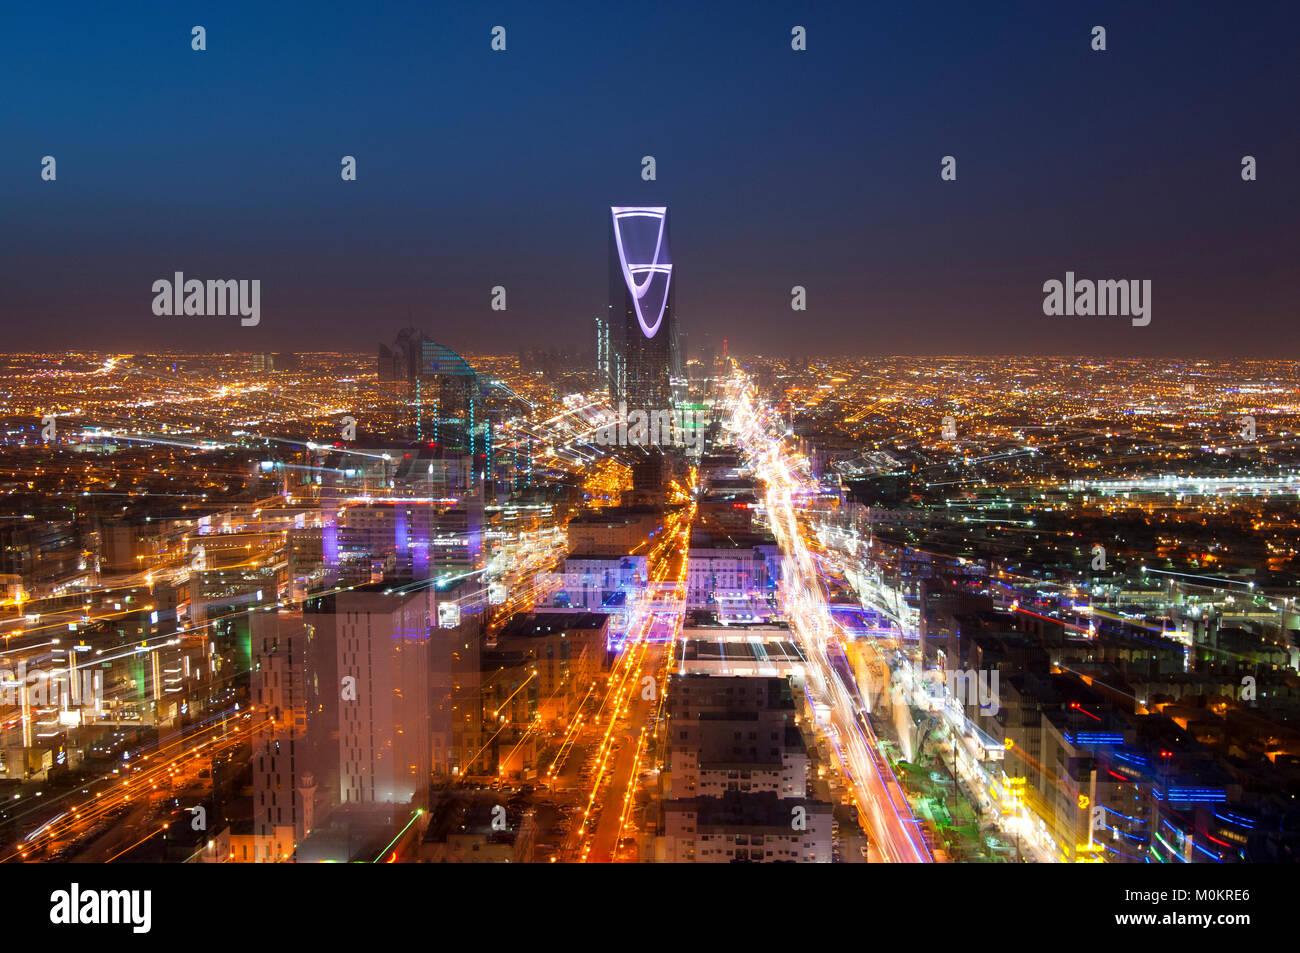 Riyadh skyline at night #3 Photo Stock